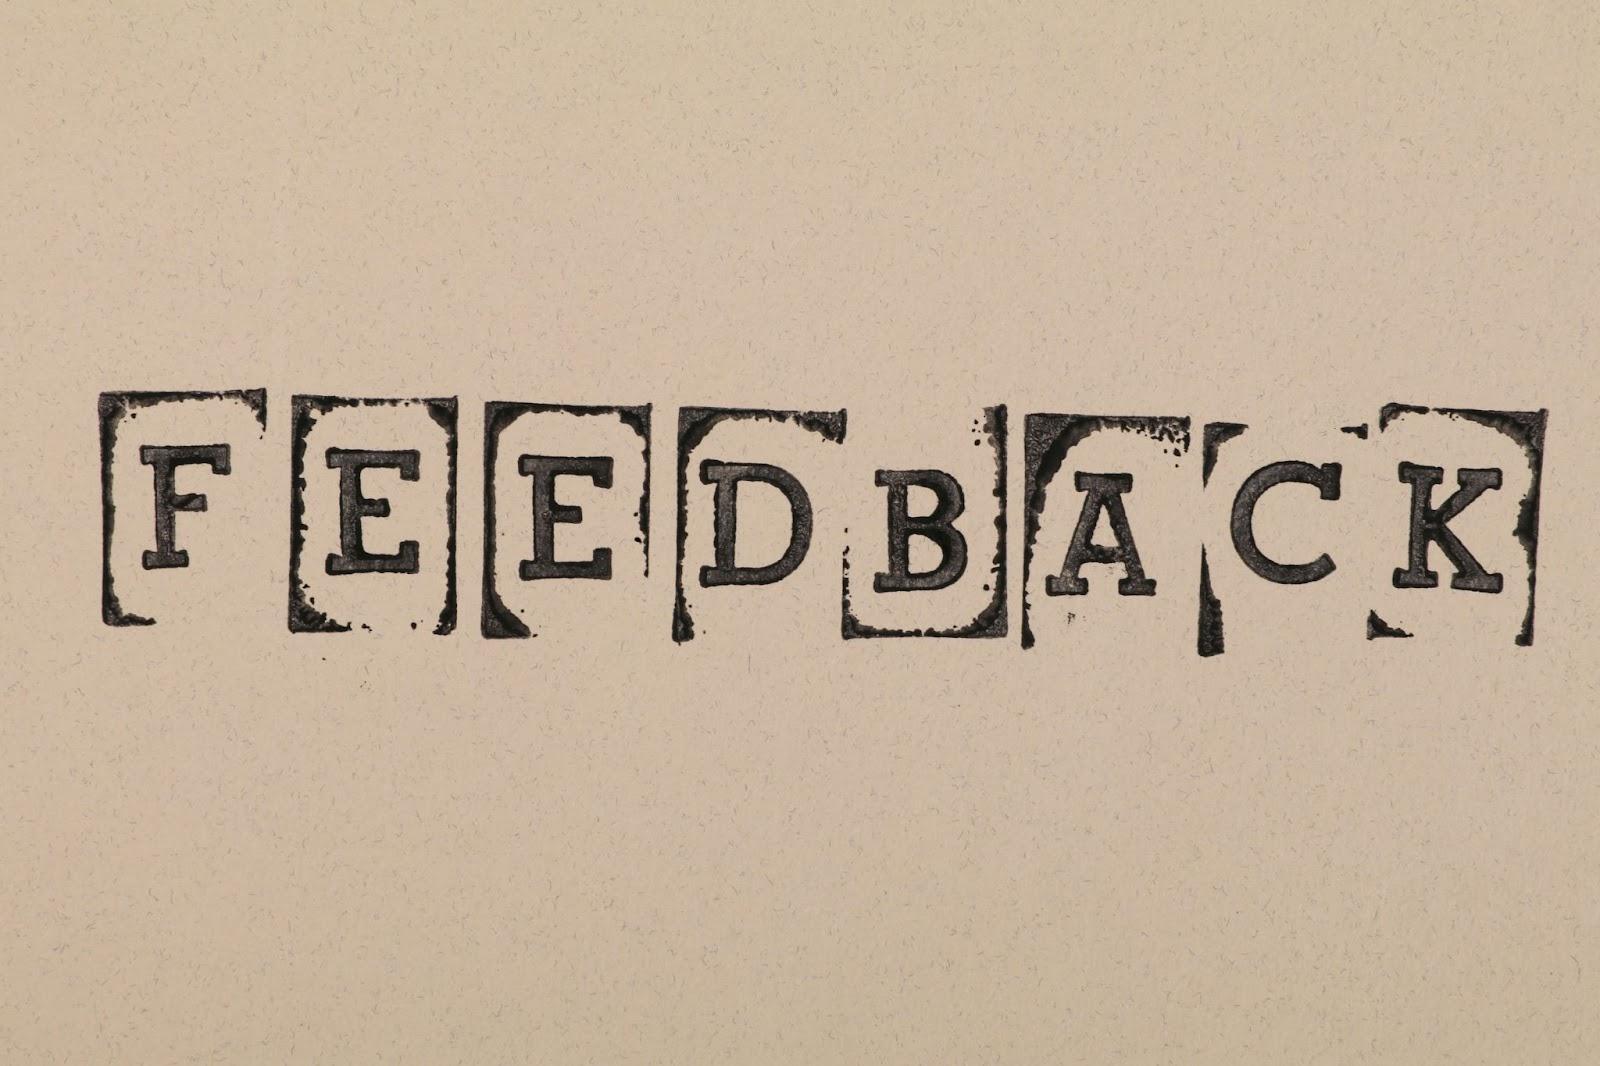 Feedback print